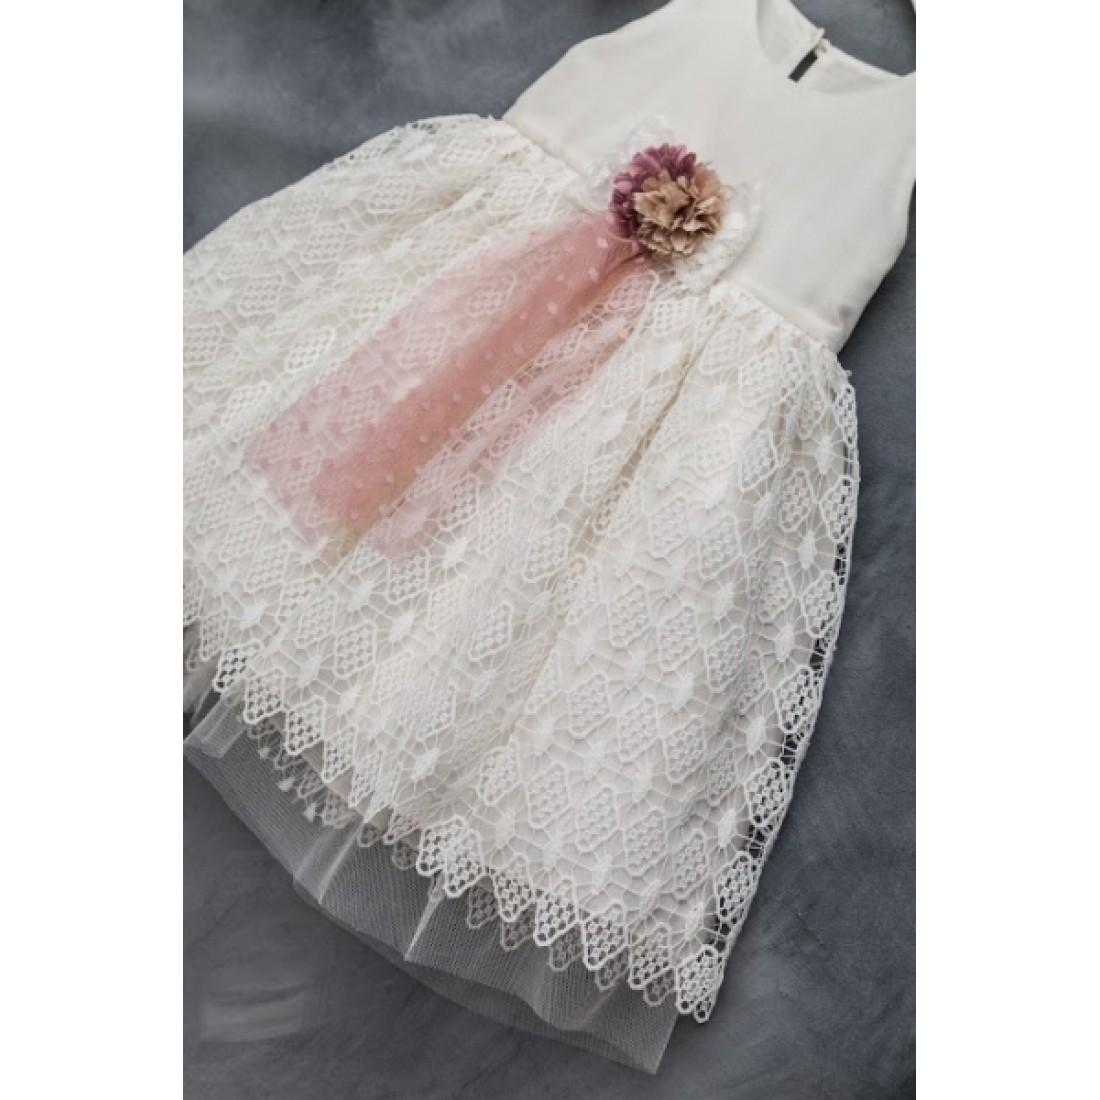 46082e58d58 Βαπτιστικό Φόρεμα Sara